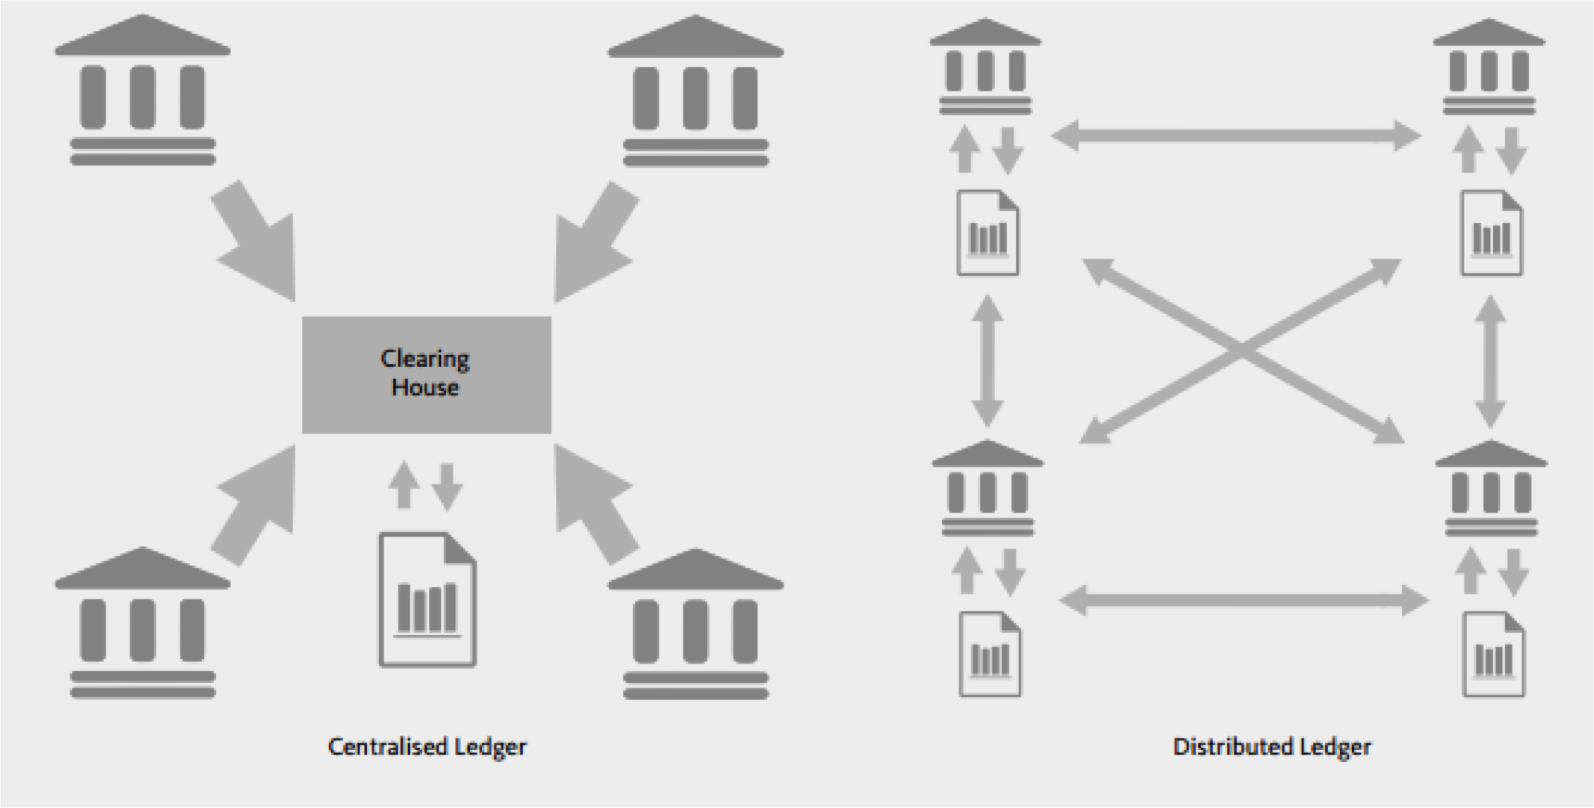 centralized vs distributed ledger